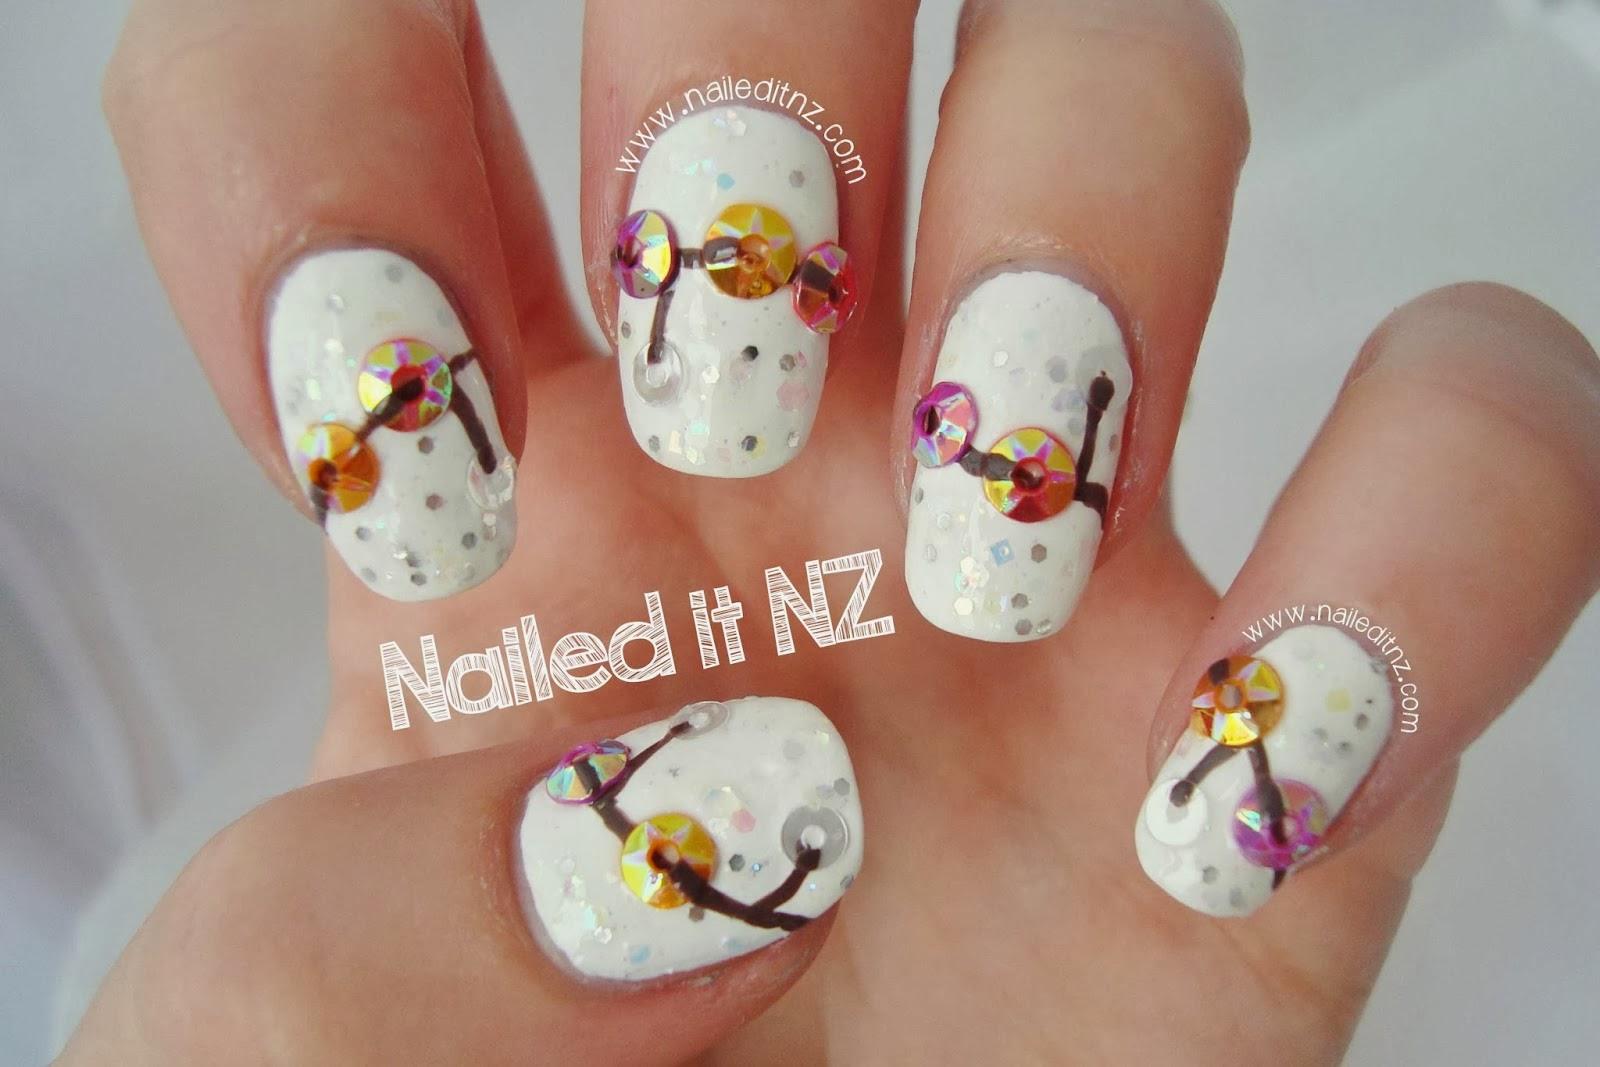 Born Pretty Store Blog: January Nail Art Designs Show